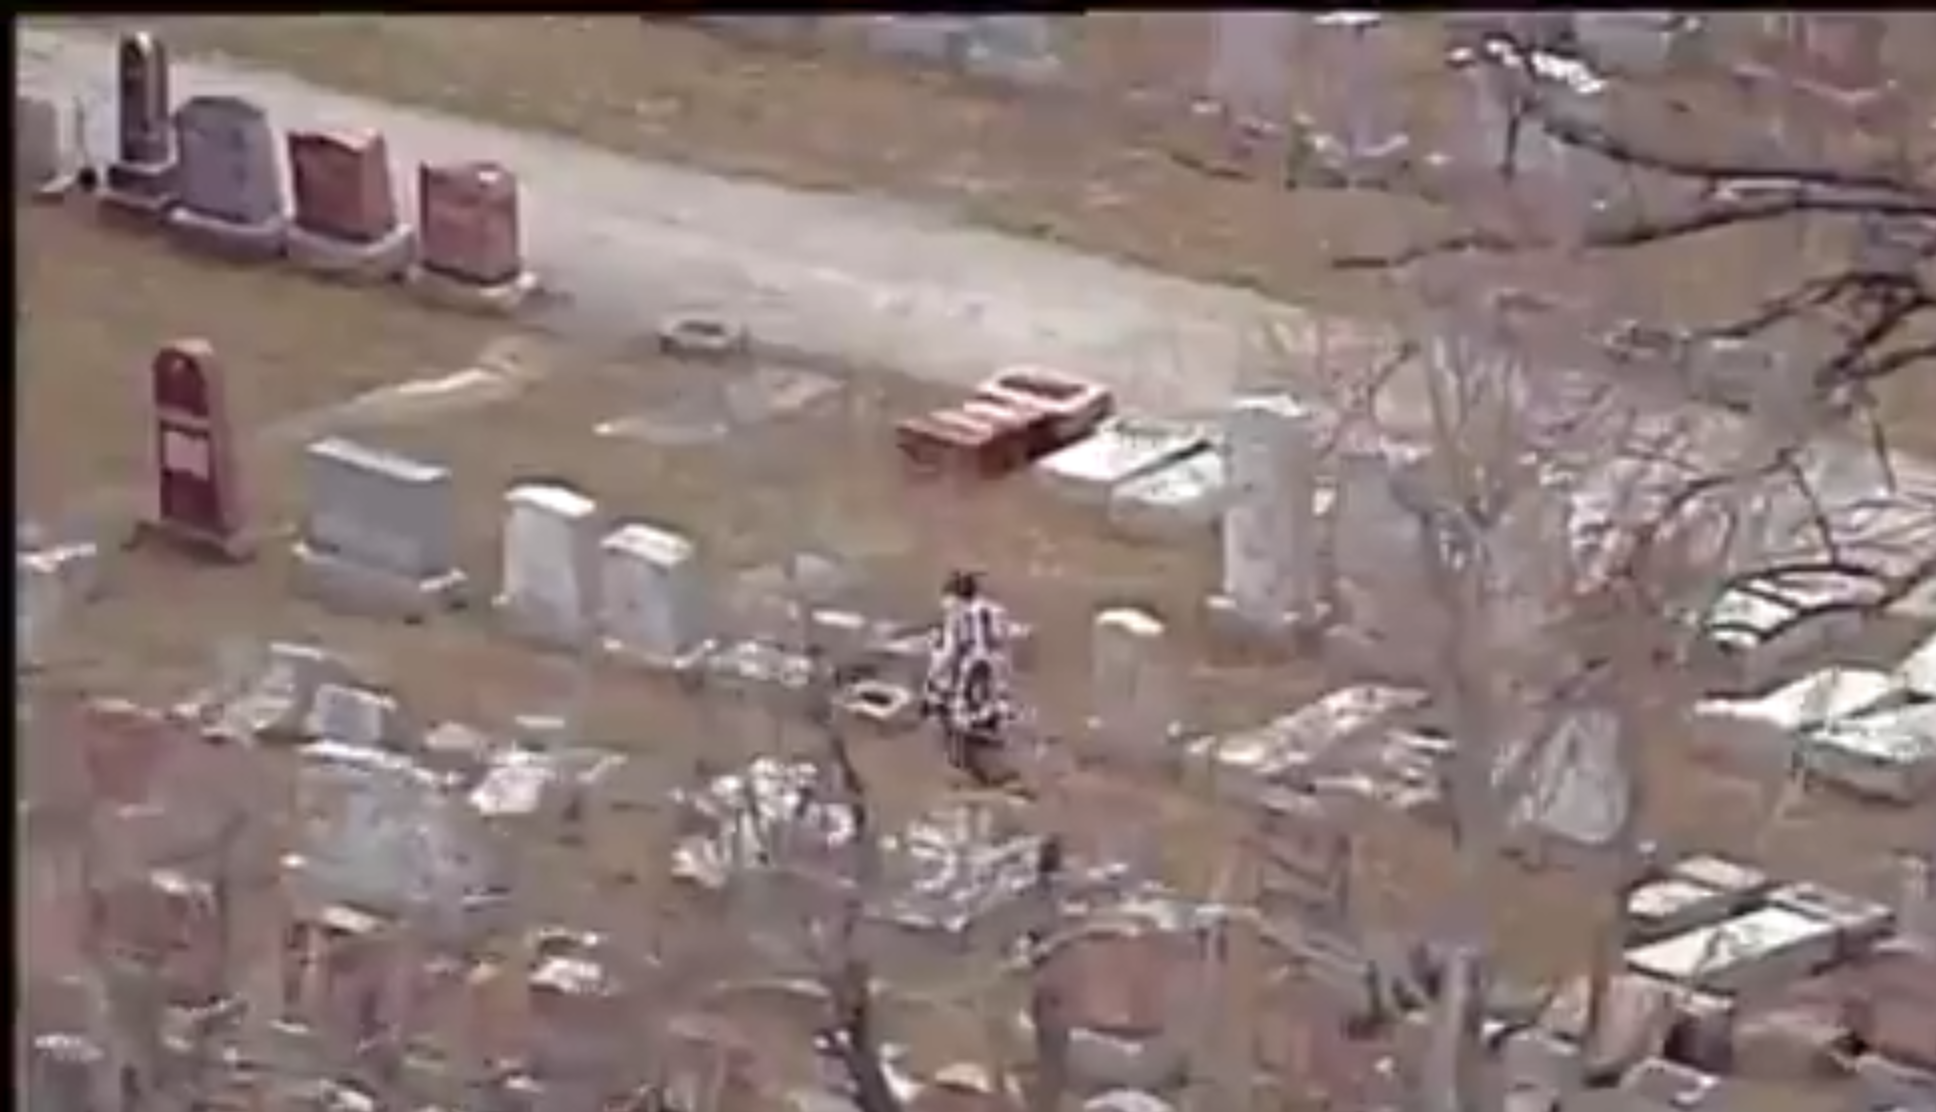 American anti-Semitism: US Muslims raise $50000 to fix  vandalised Jewish cemetery headstones